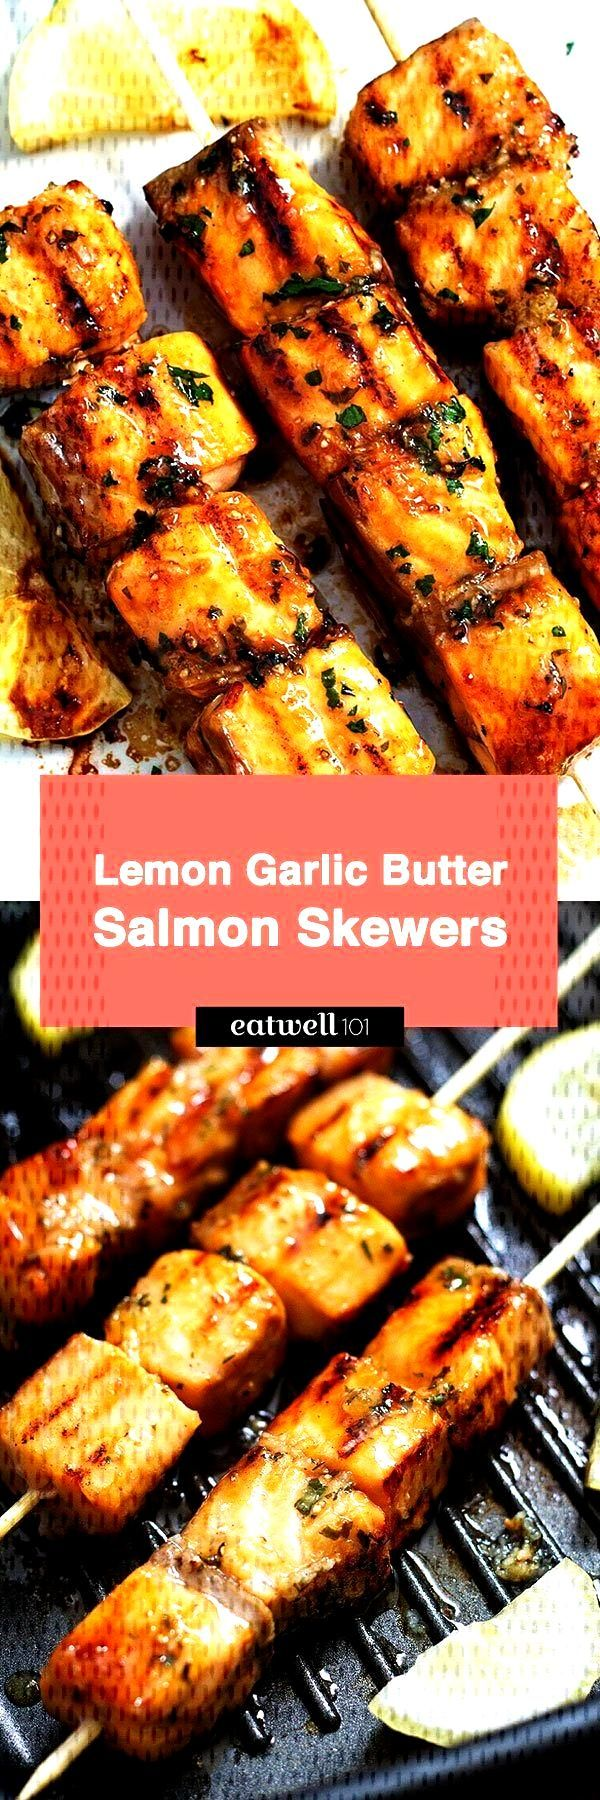 Lemon-garlic butter grilled salmon - sea-food recipes marinade ..., ... - Lemon-garlic butter gril